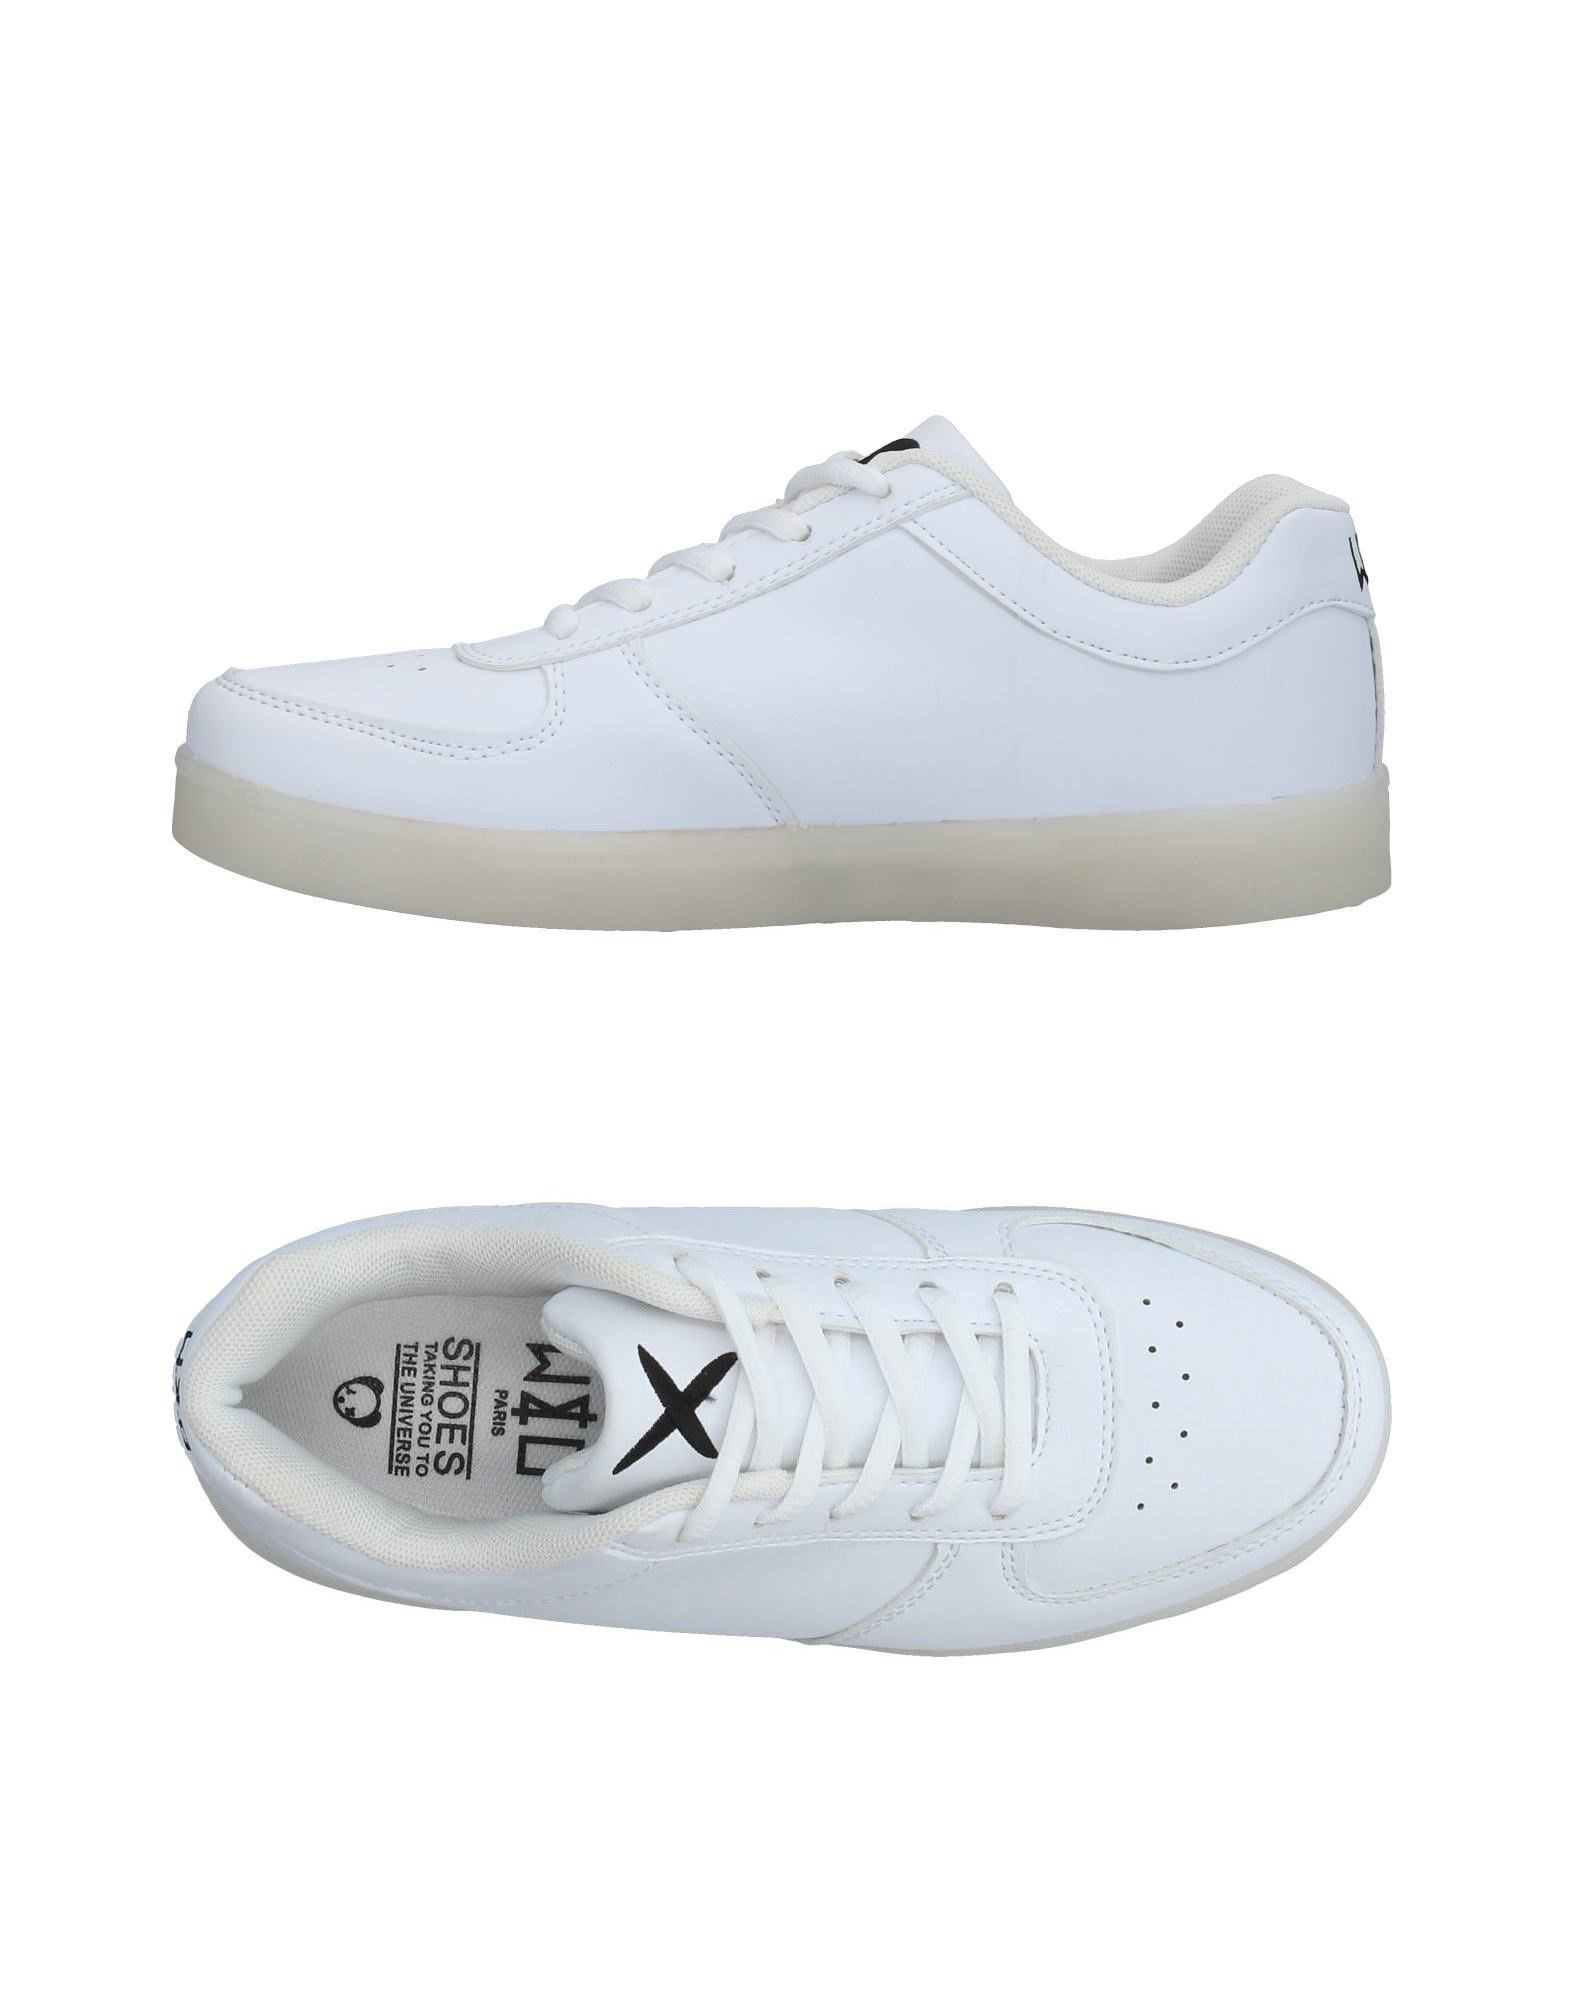 Sneakers Wize & Ope Femme - Sneakers Wize & Ope sur